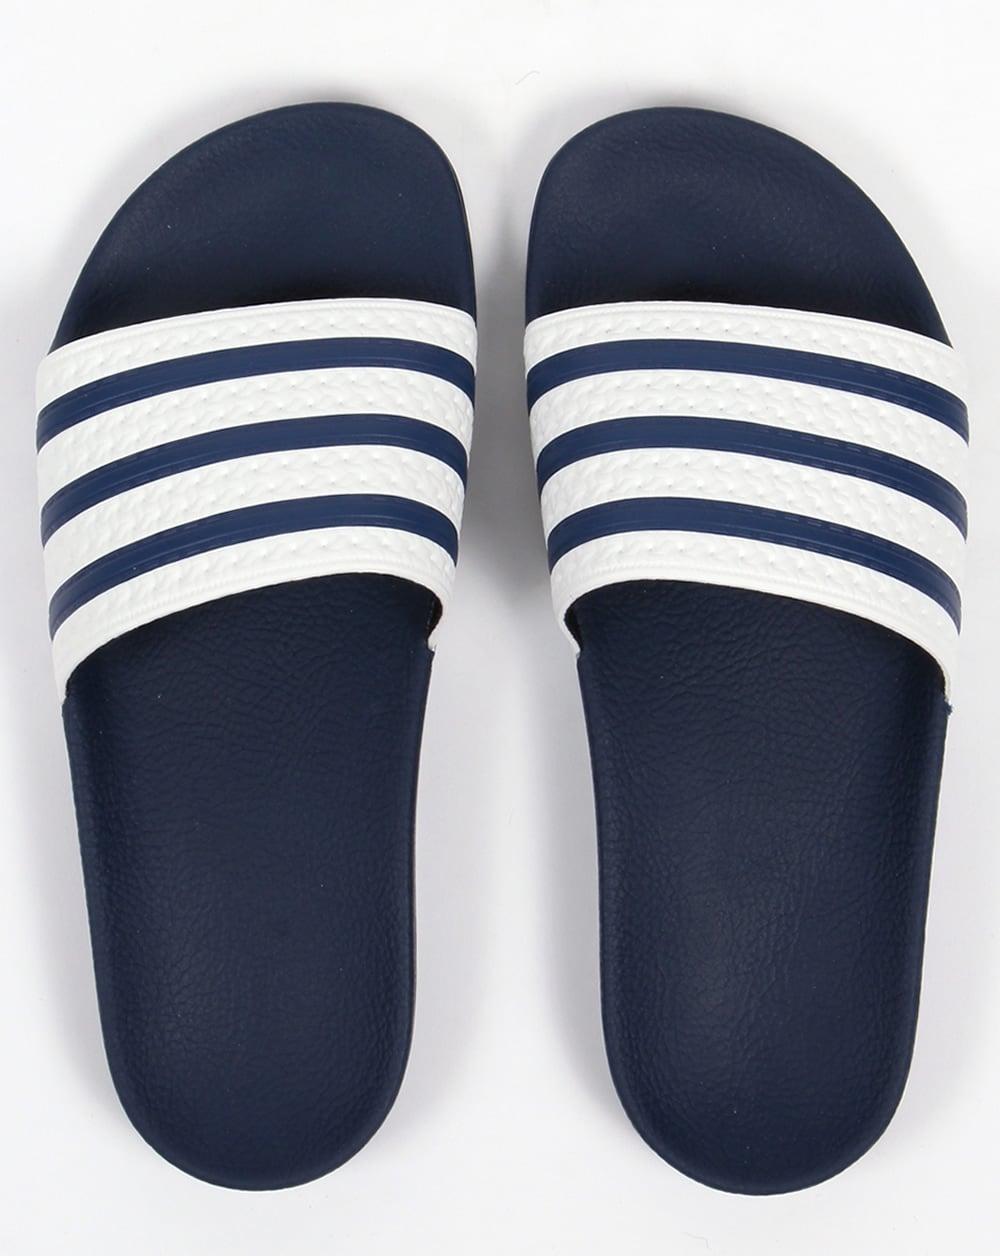 Buy cheap adidas slides mens blue \u003eUp